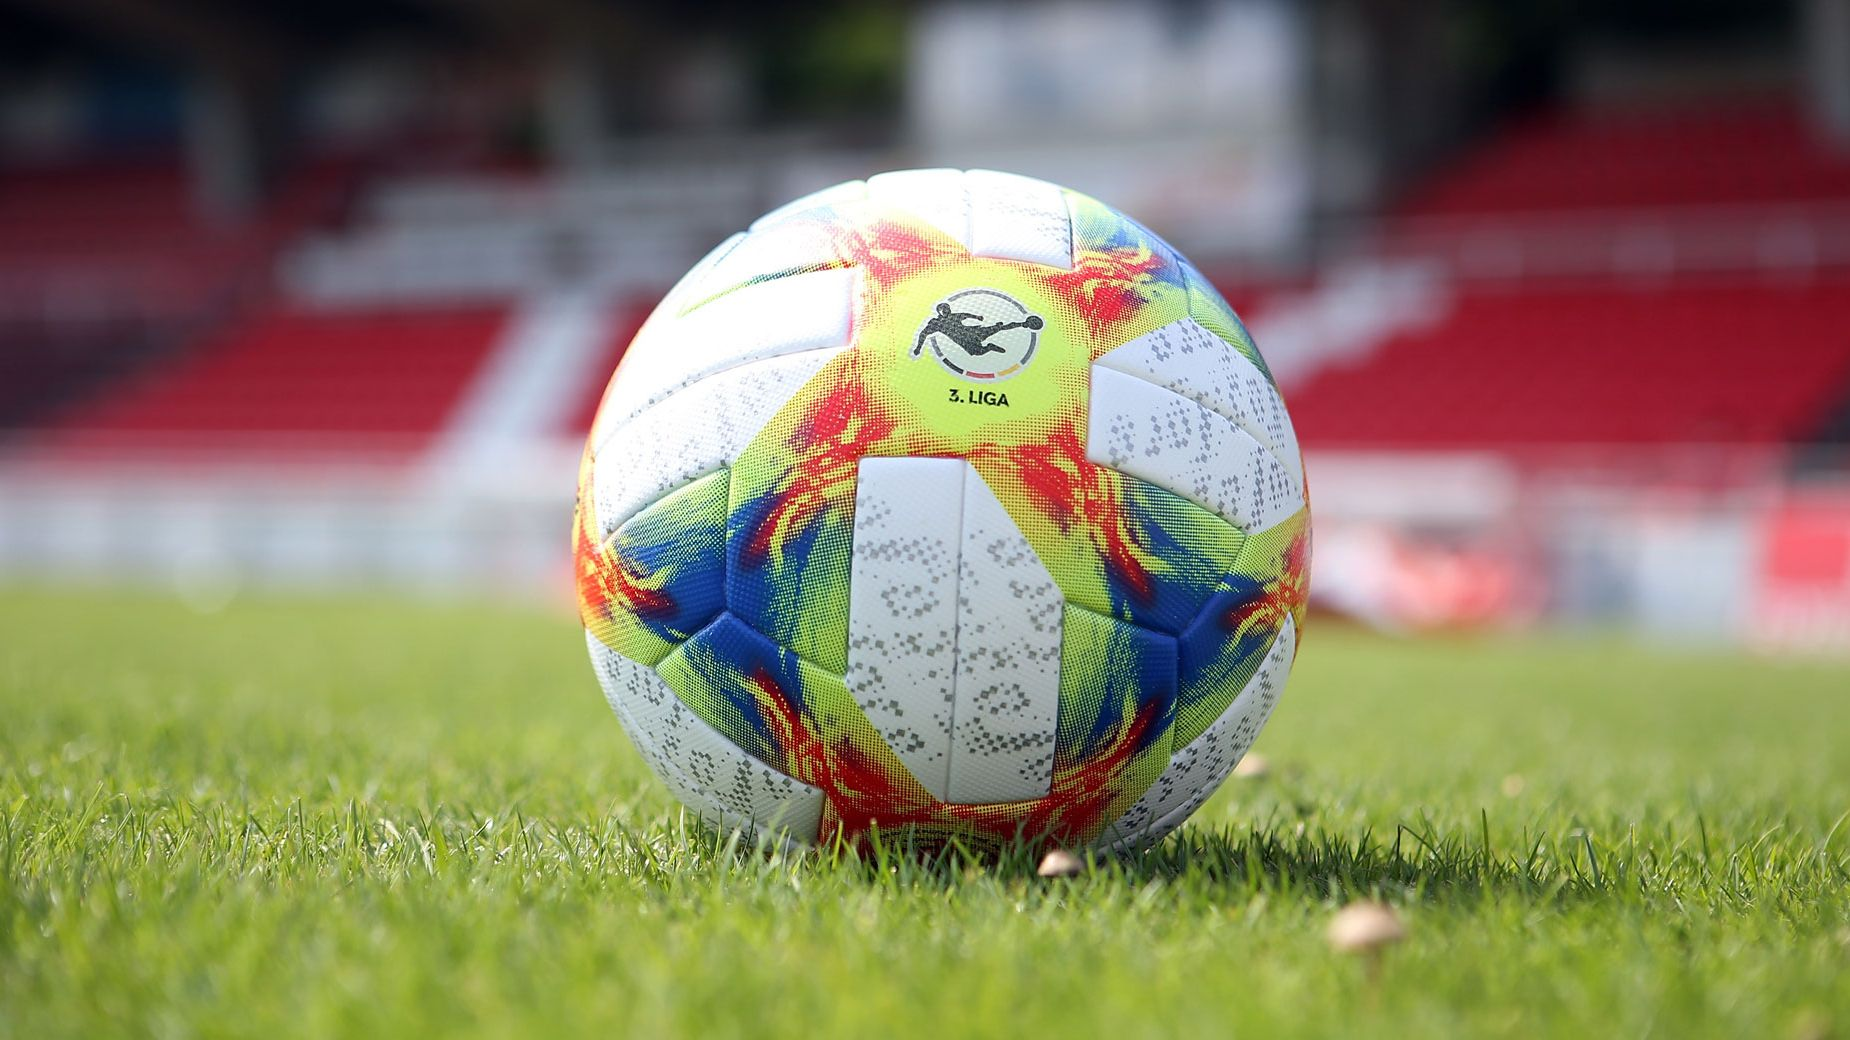 Spielball der 3. Liga